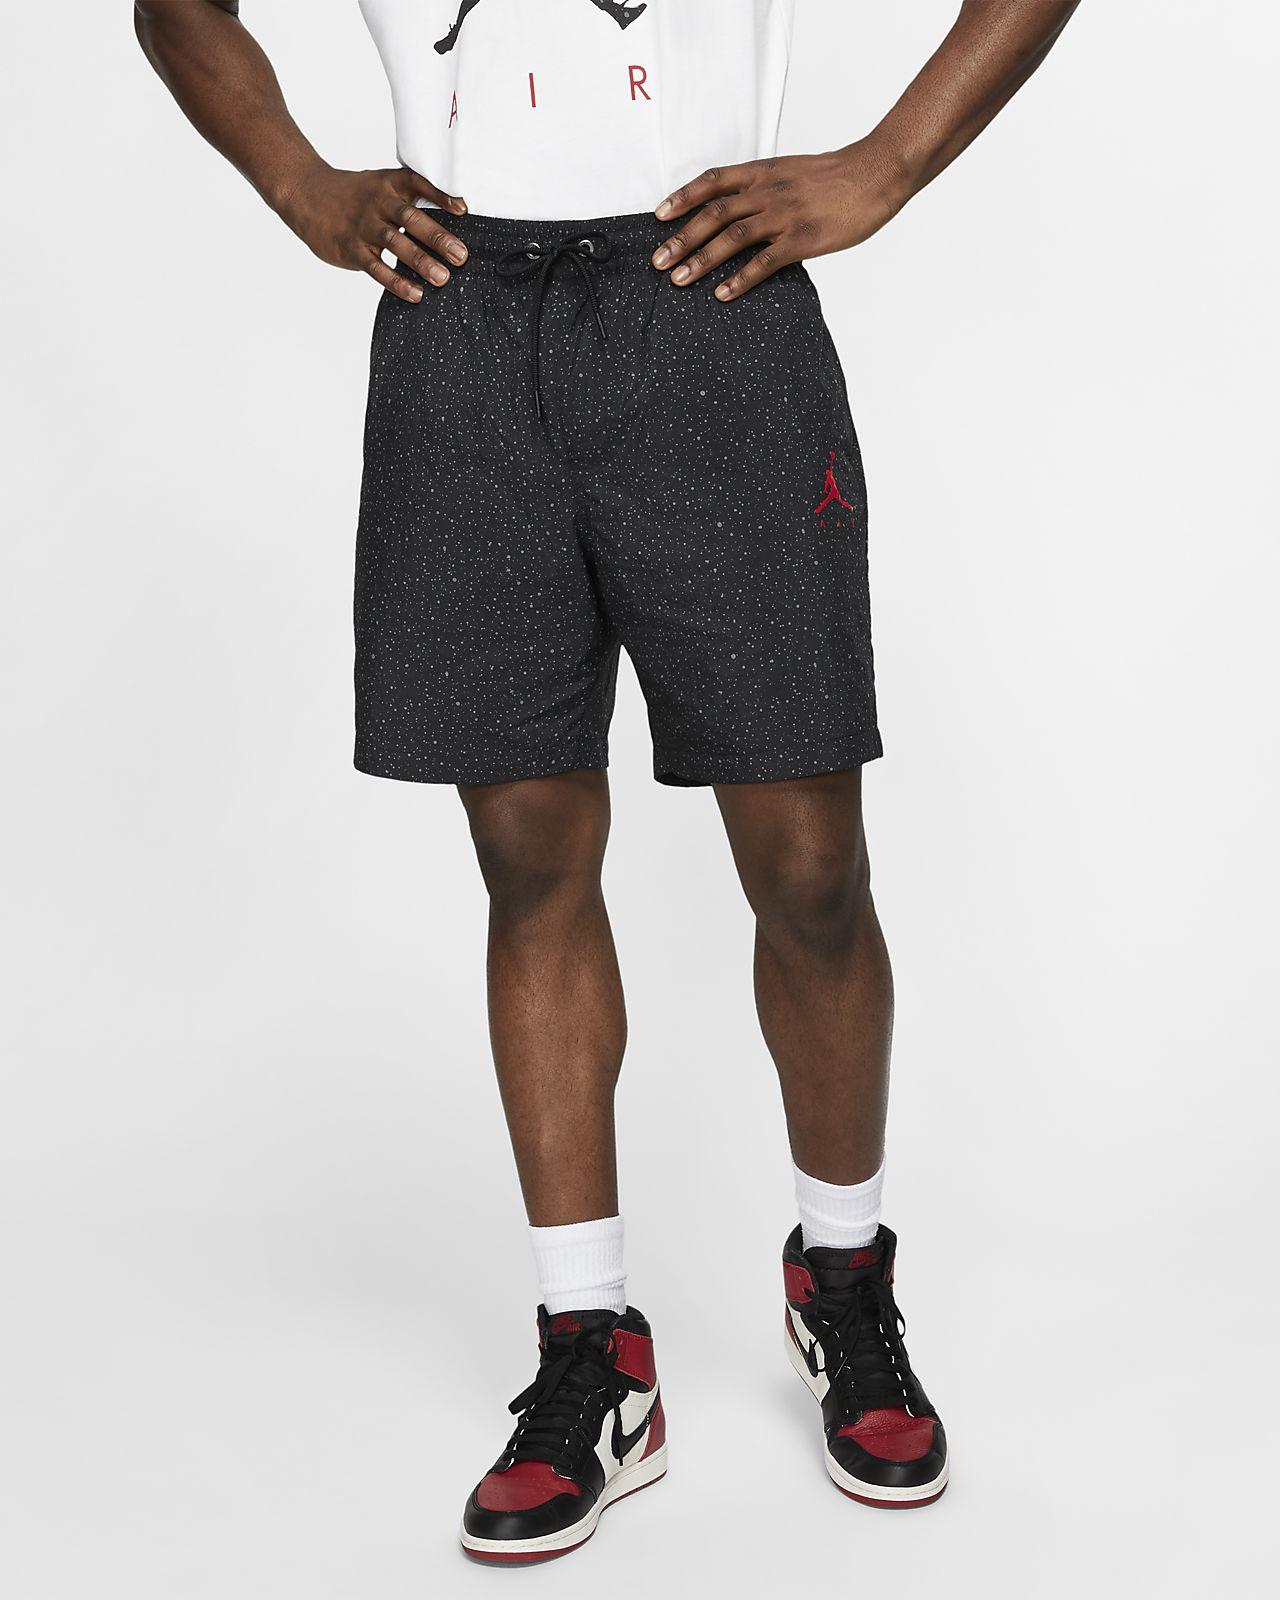 797eb331e8d5 Jordan Jumpman Cement Poolside Men s 18cm approx. Shorts. Nike.com NZ